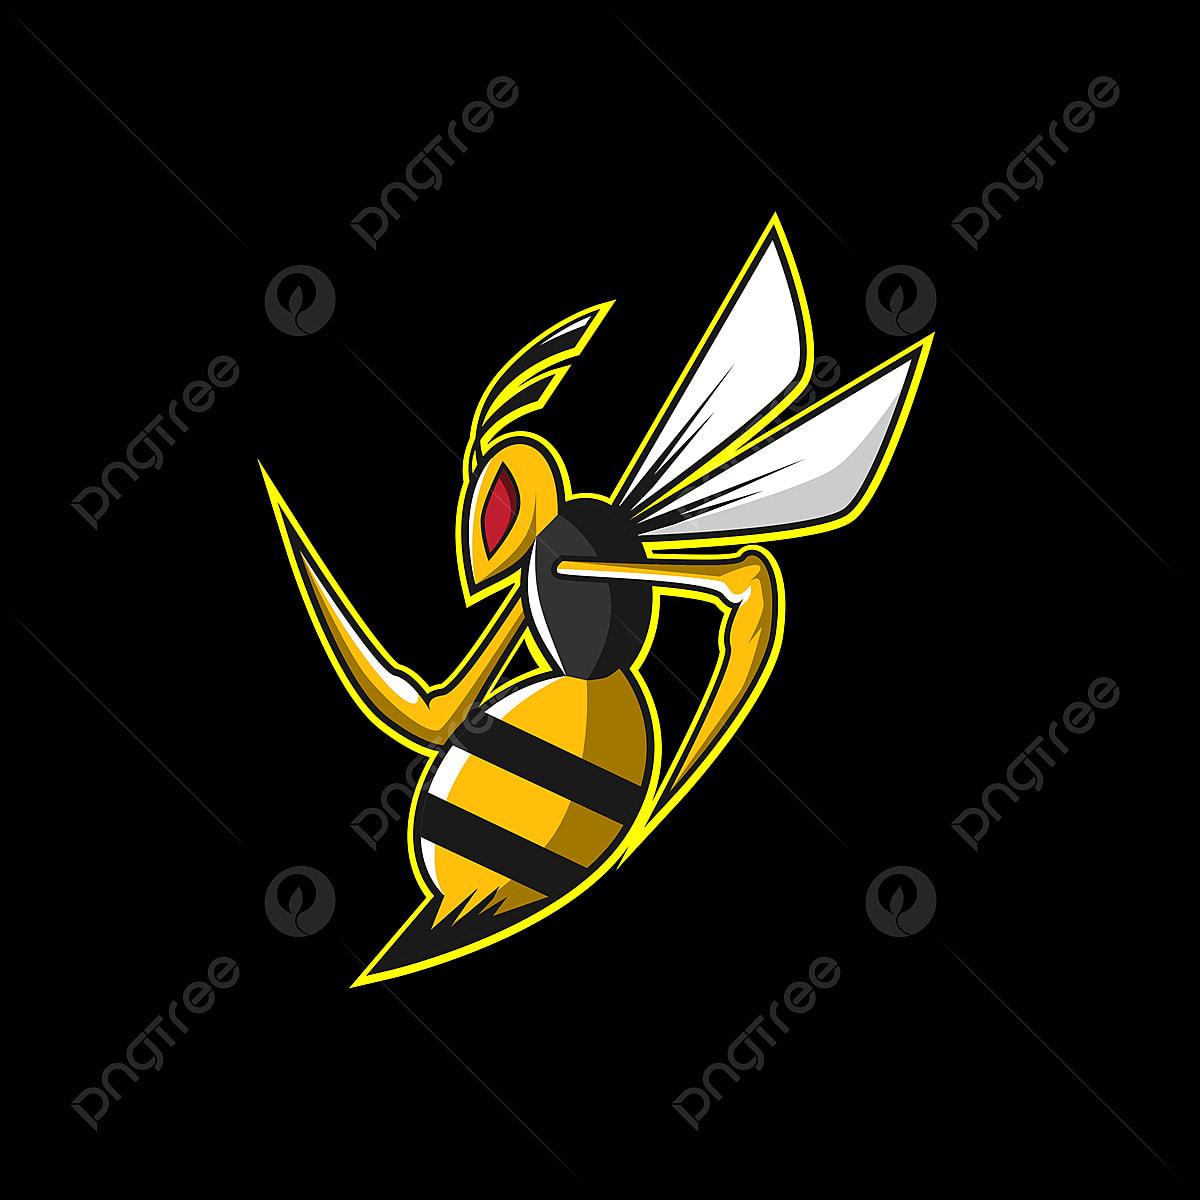 Bee Esports Logo, Esport, Illustration, Logo PNG and Vector